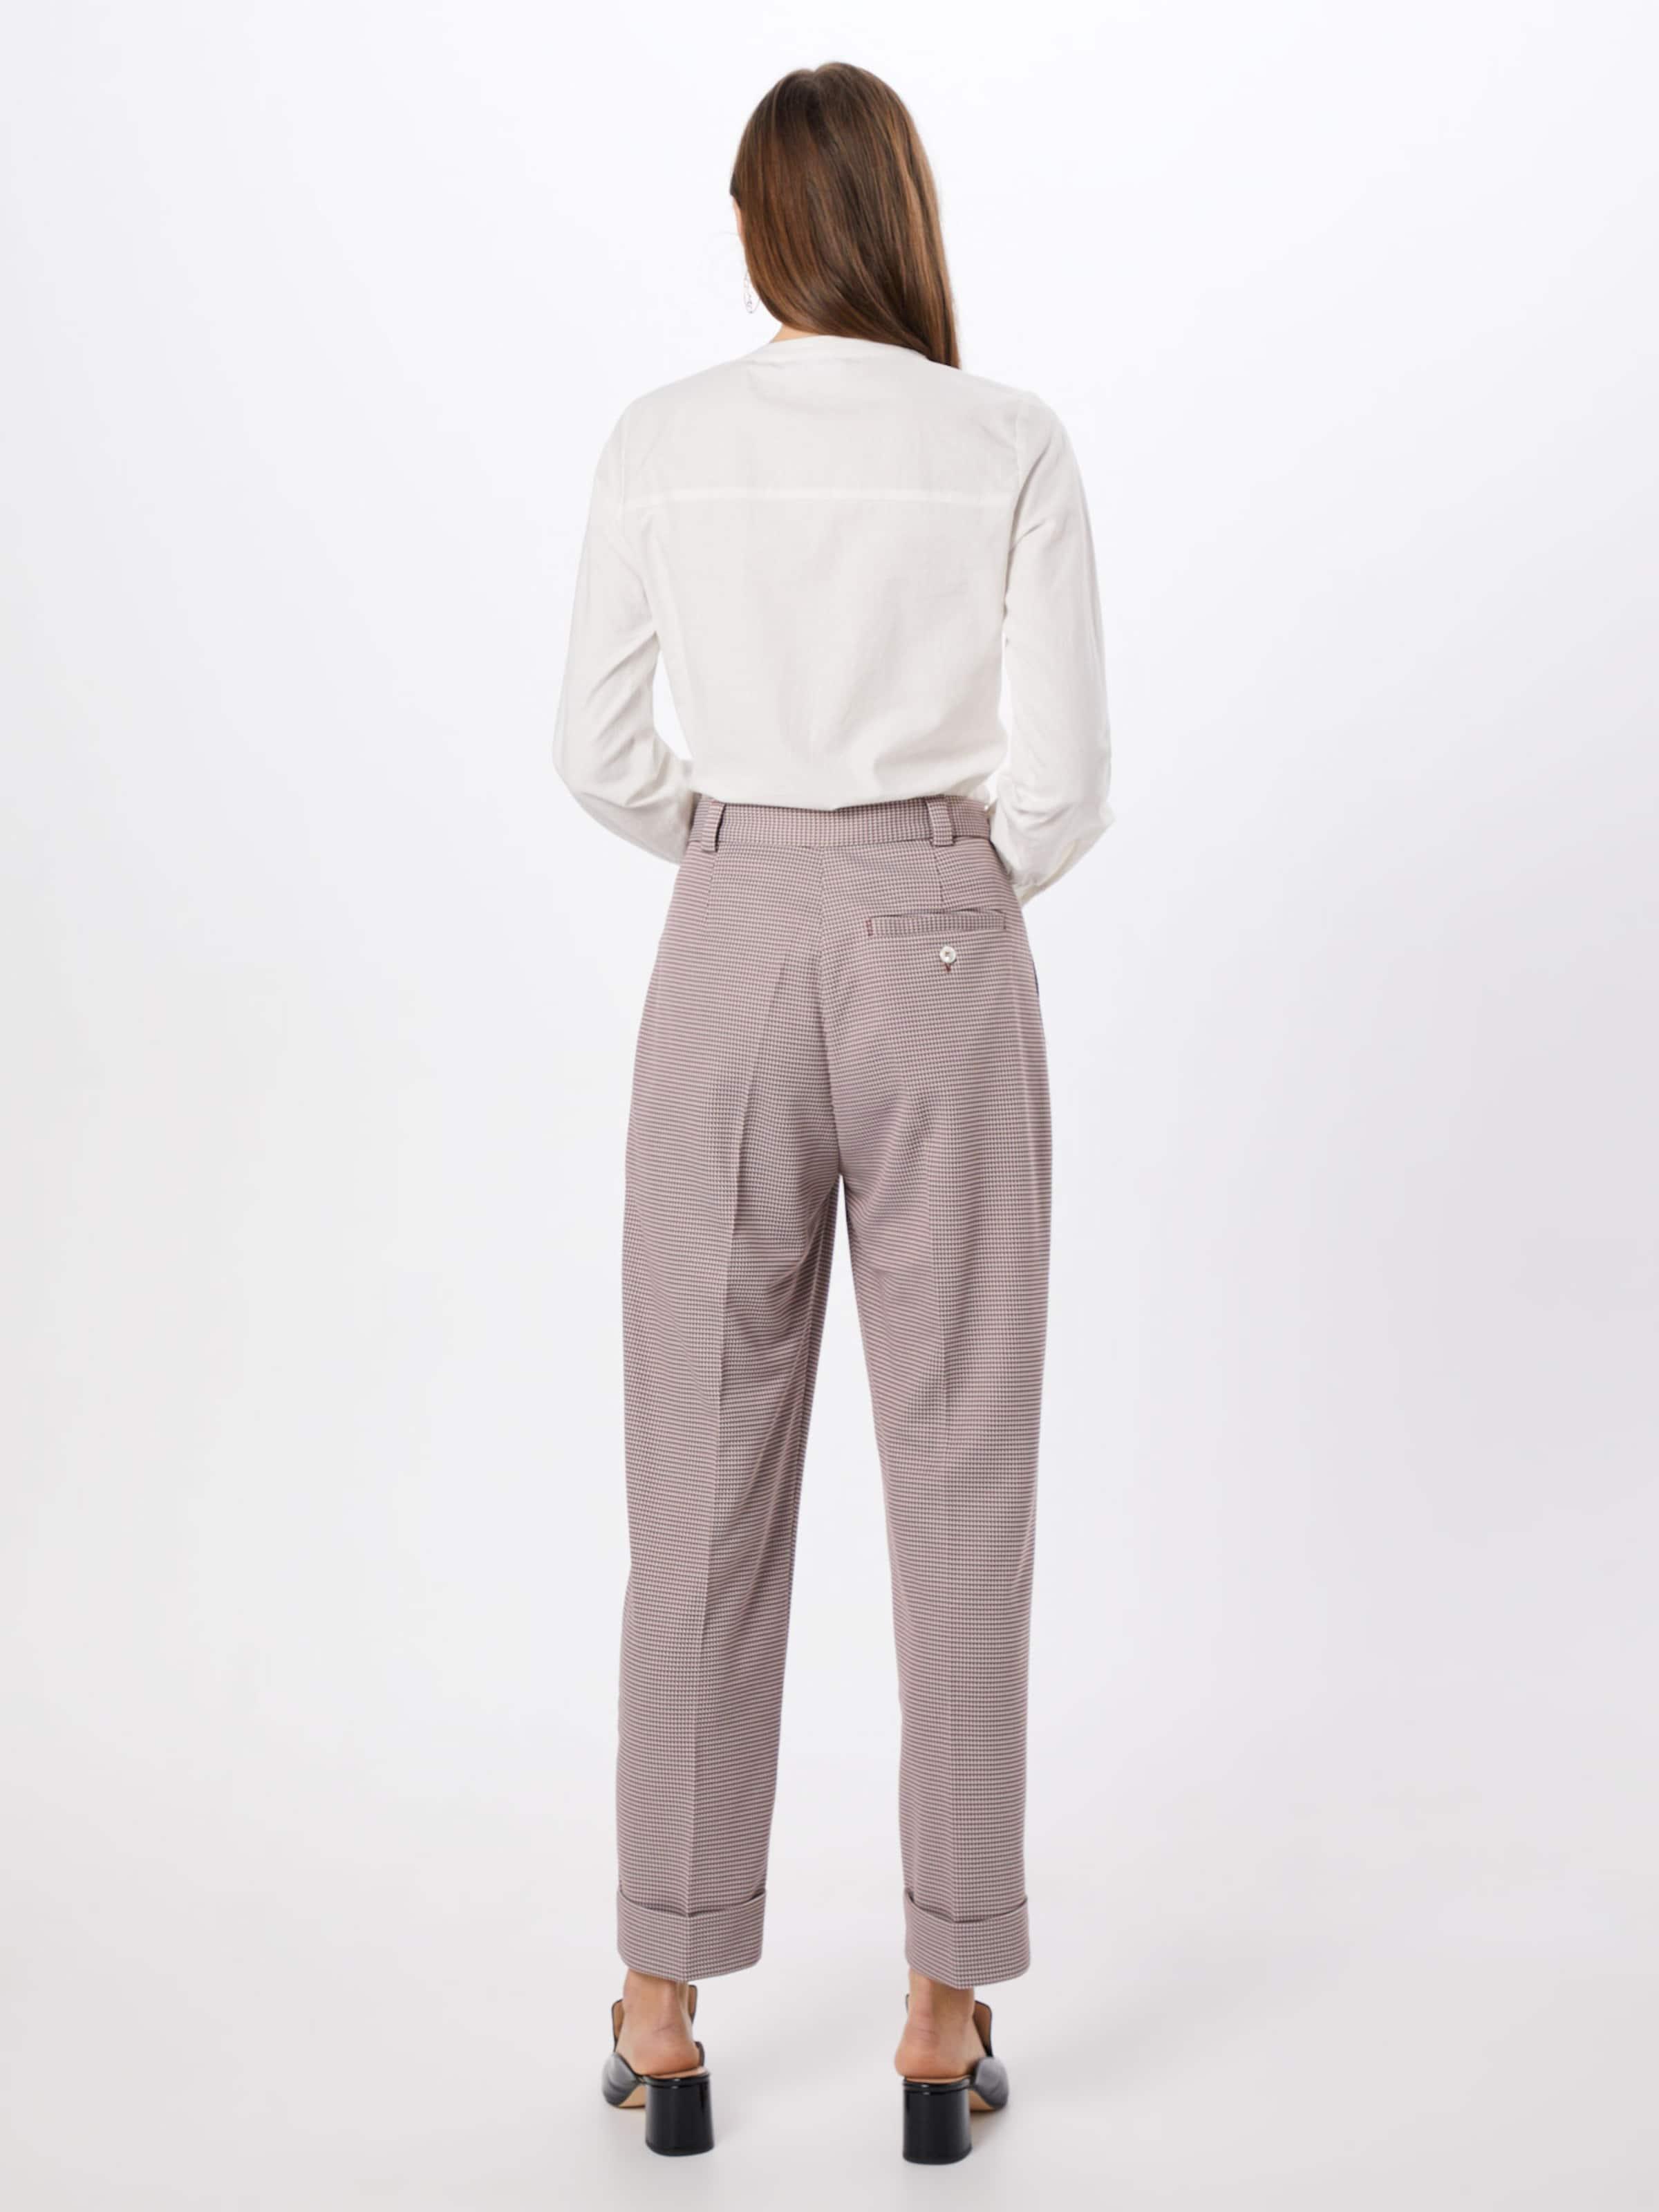 Pantalon Postyr Pince MarronBlanc À En 'sonja' wPXlkZOiuT